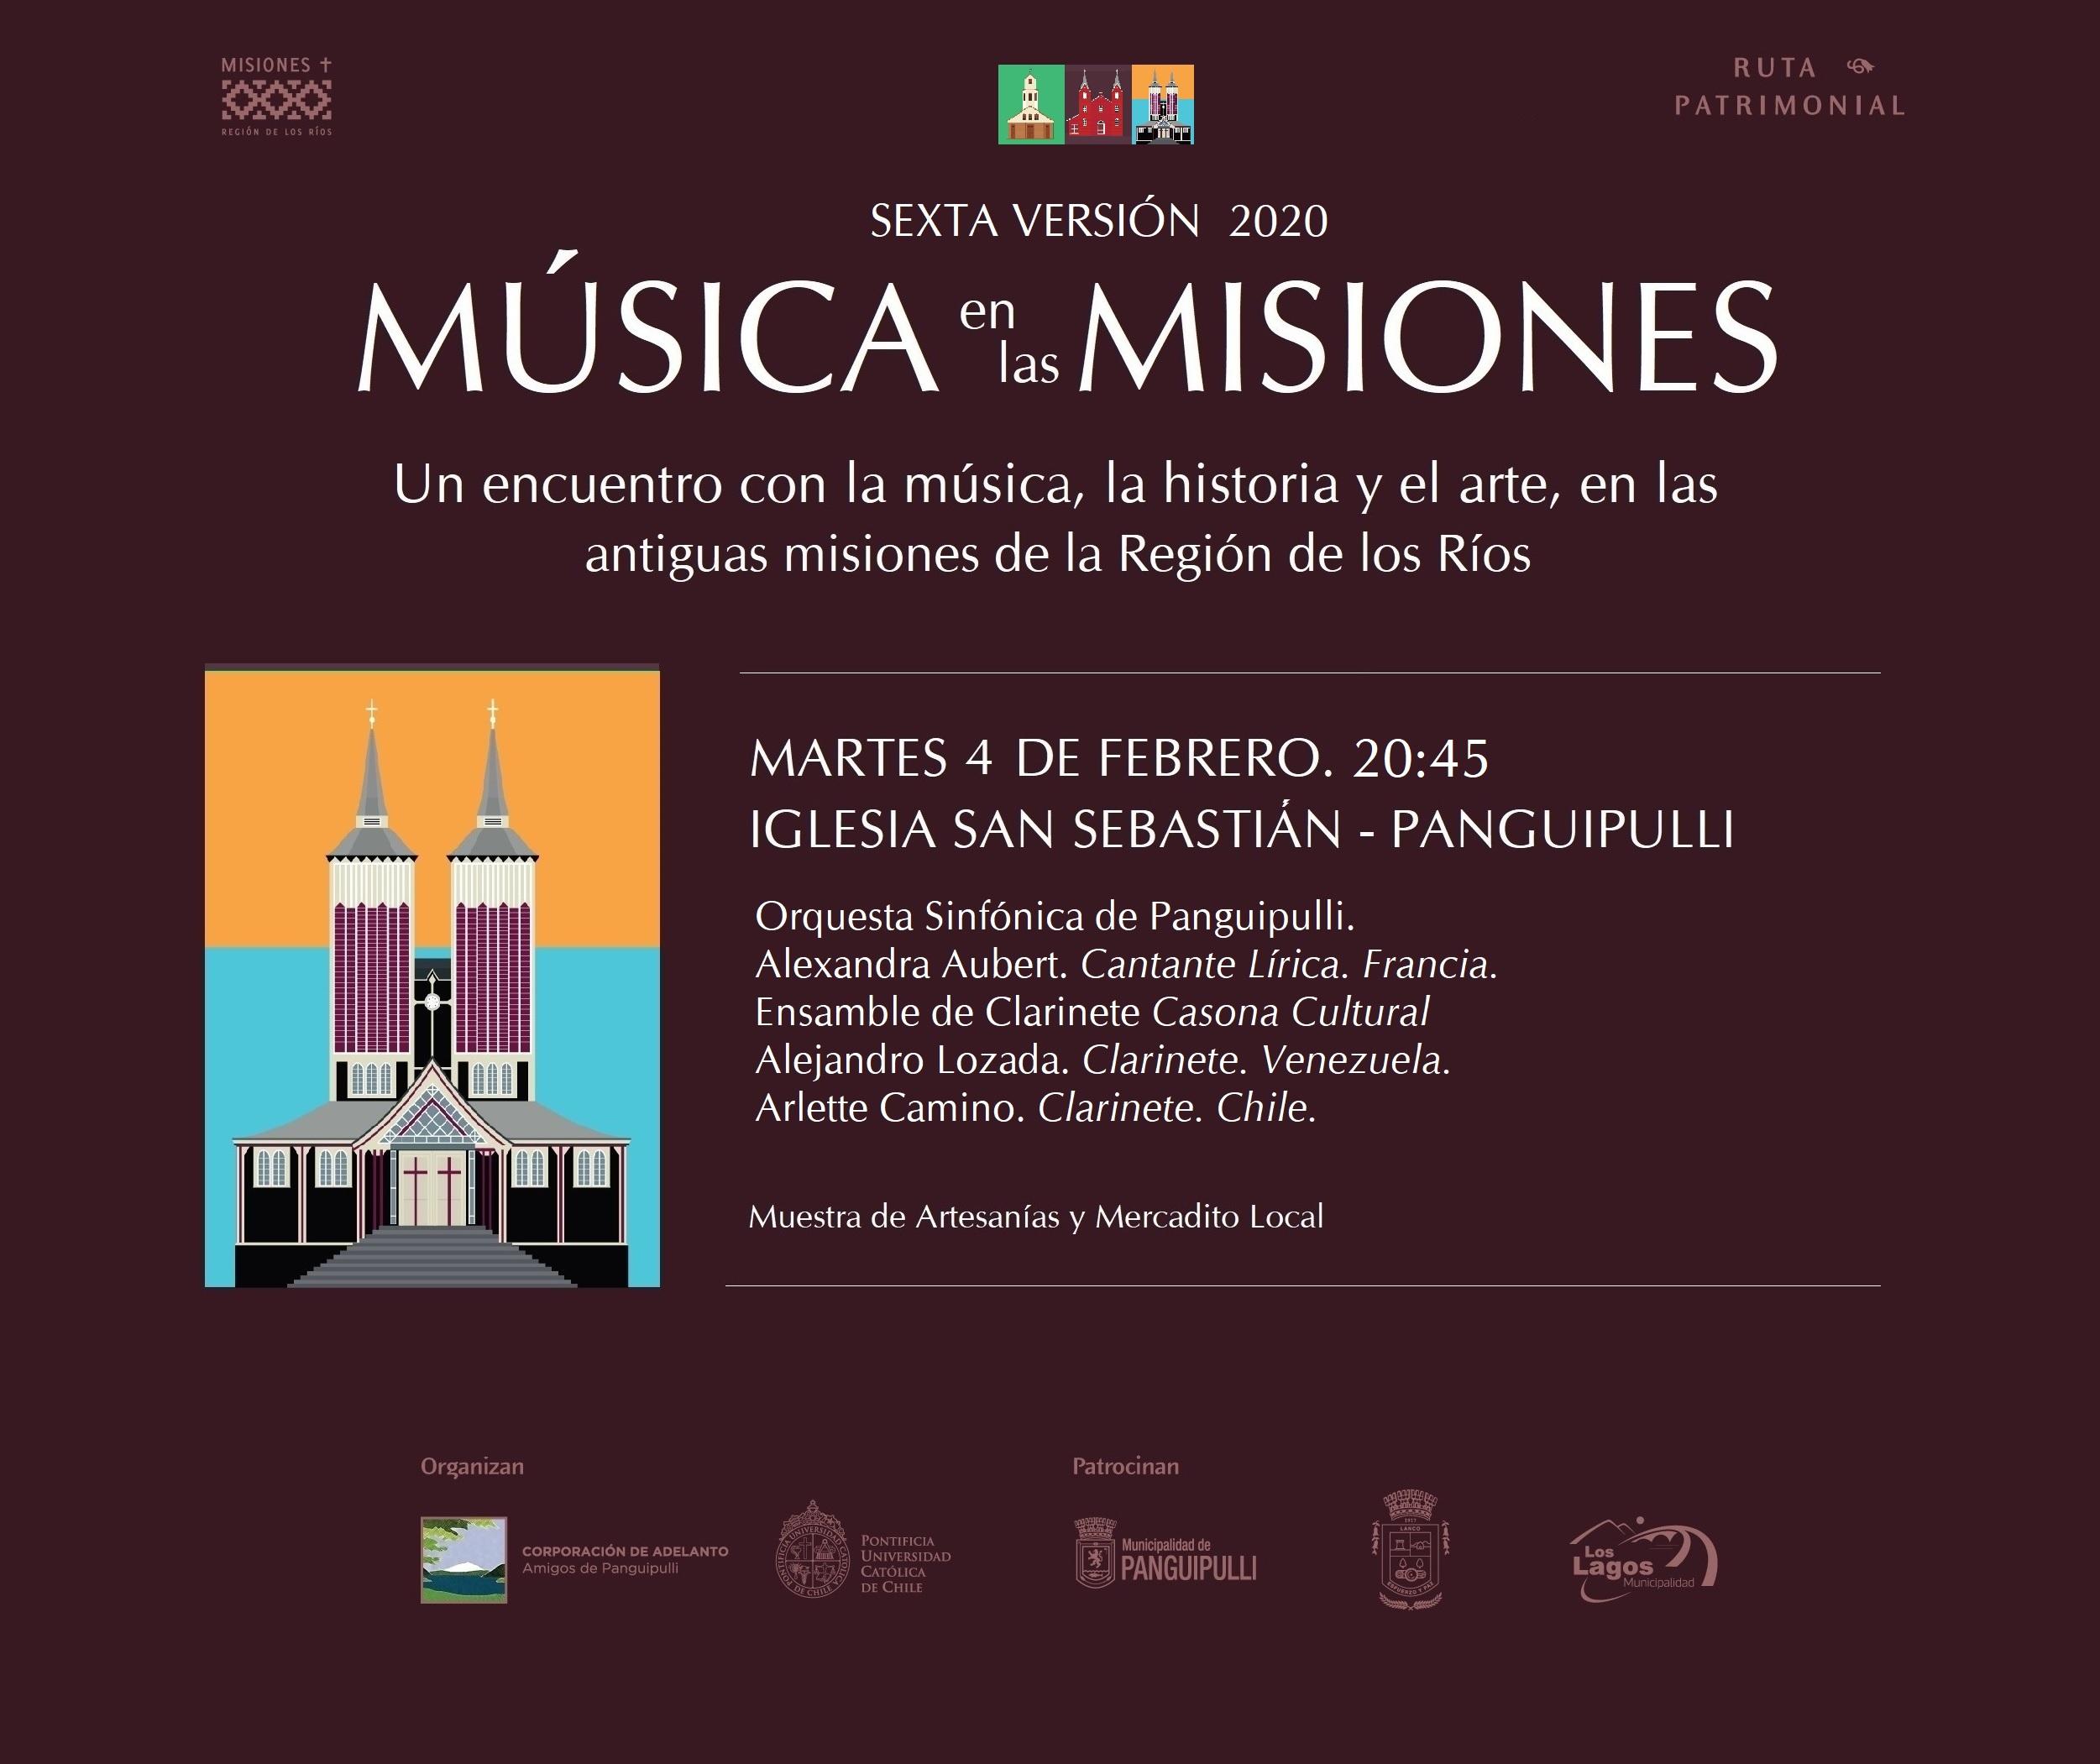 Música en las Misiones - Panguipulli